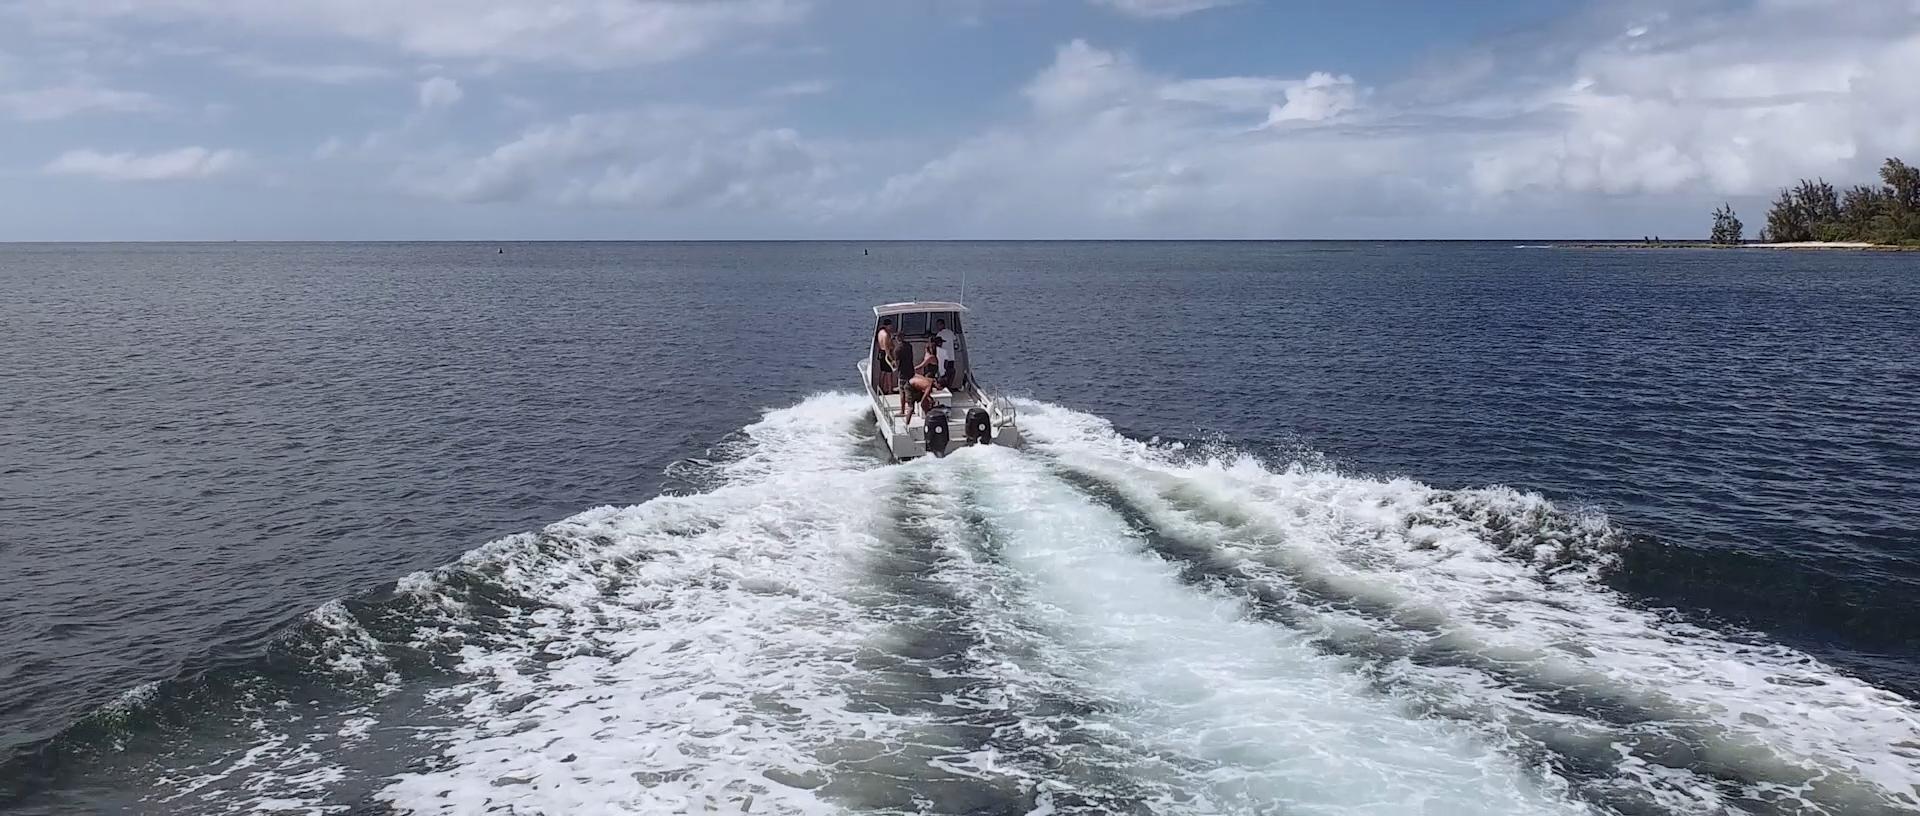 Island View Hawaii Shark Dive